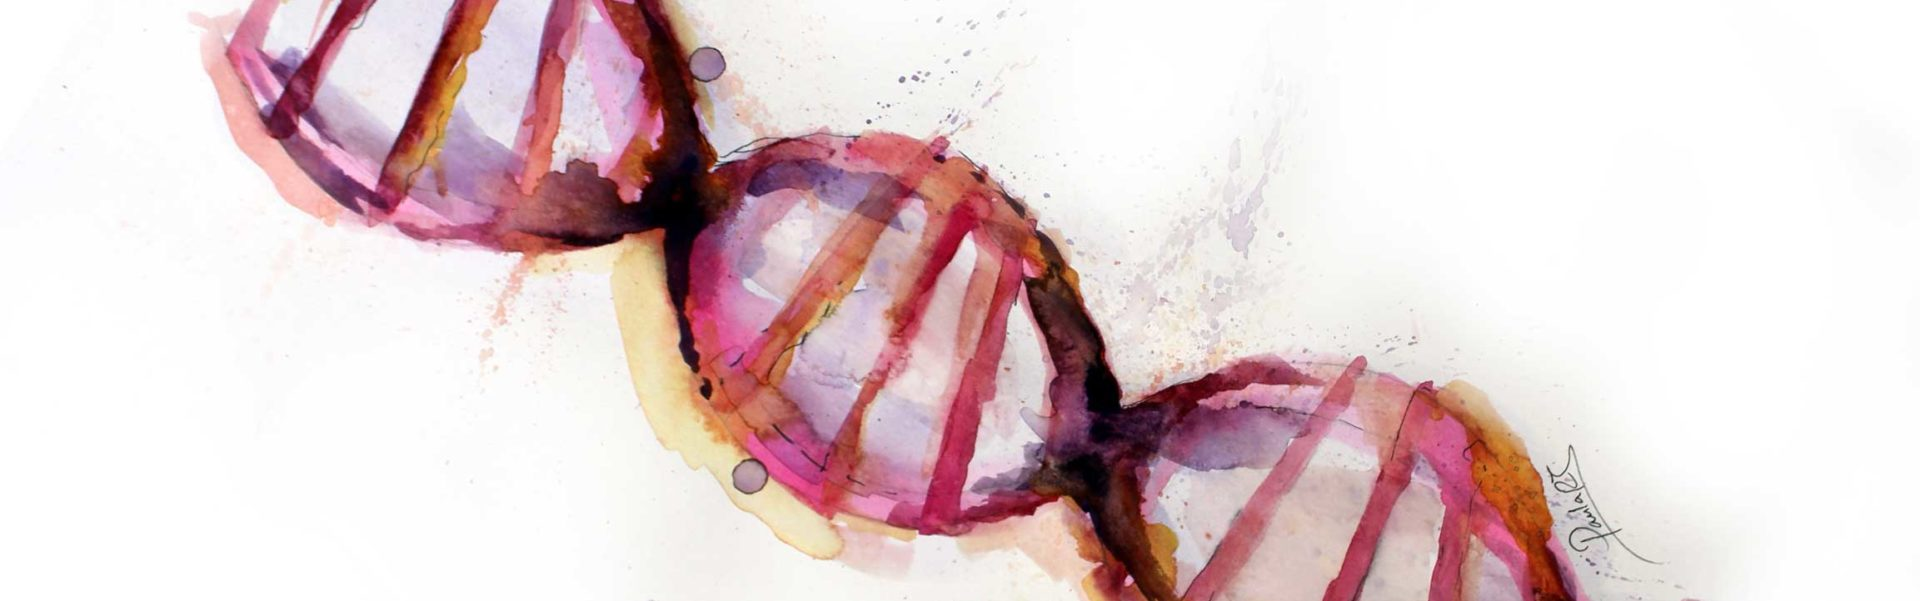 Plataformas Genómicas